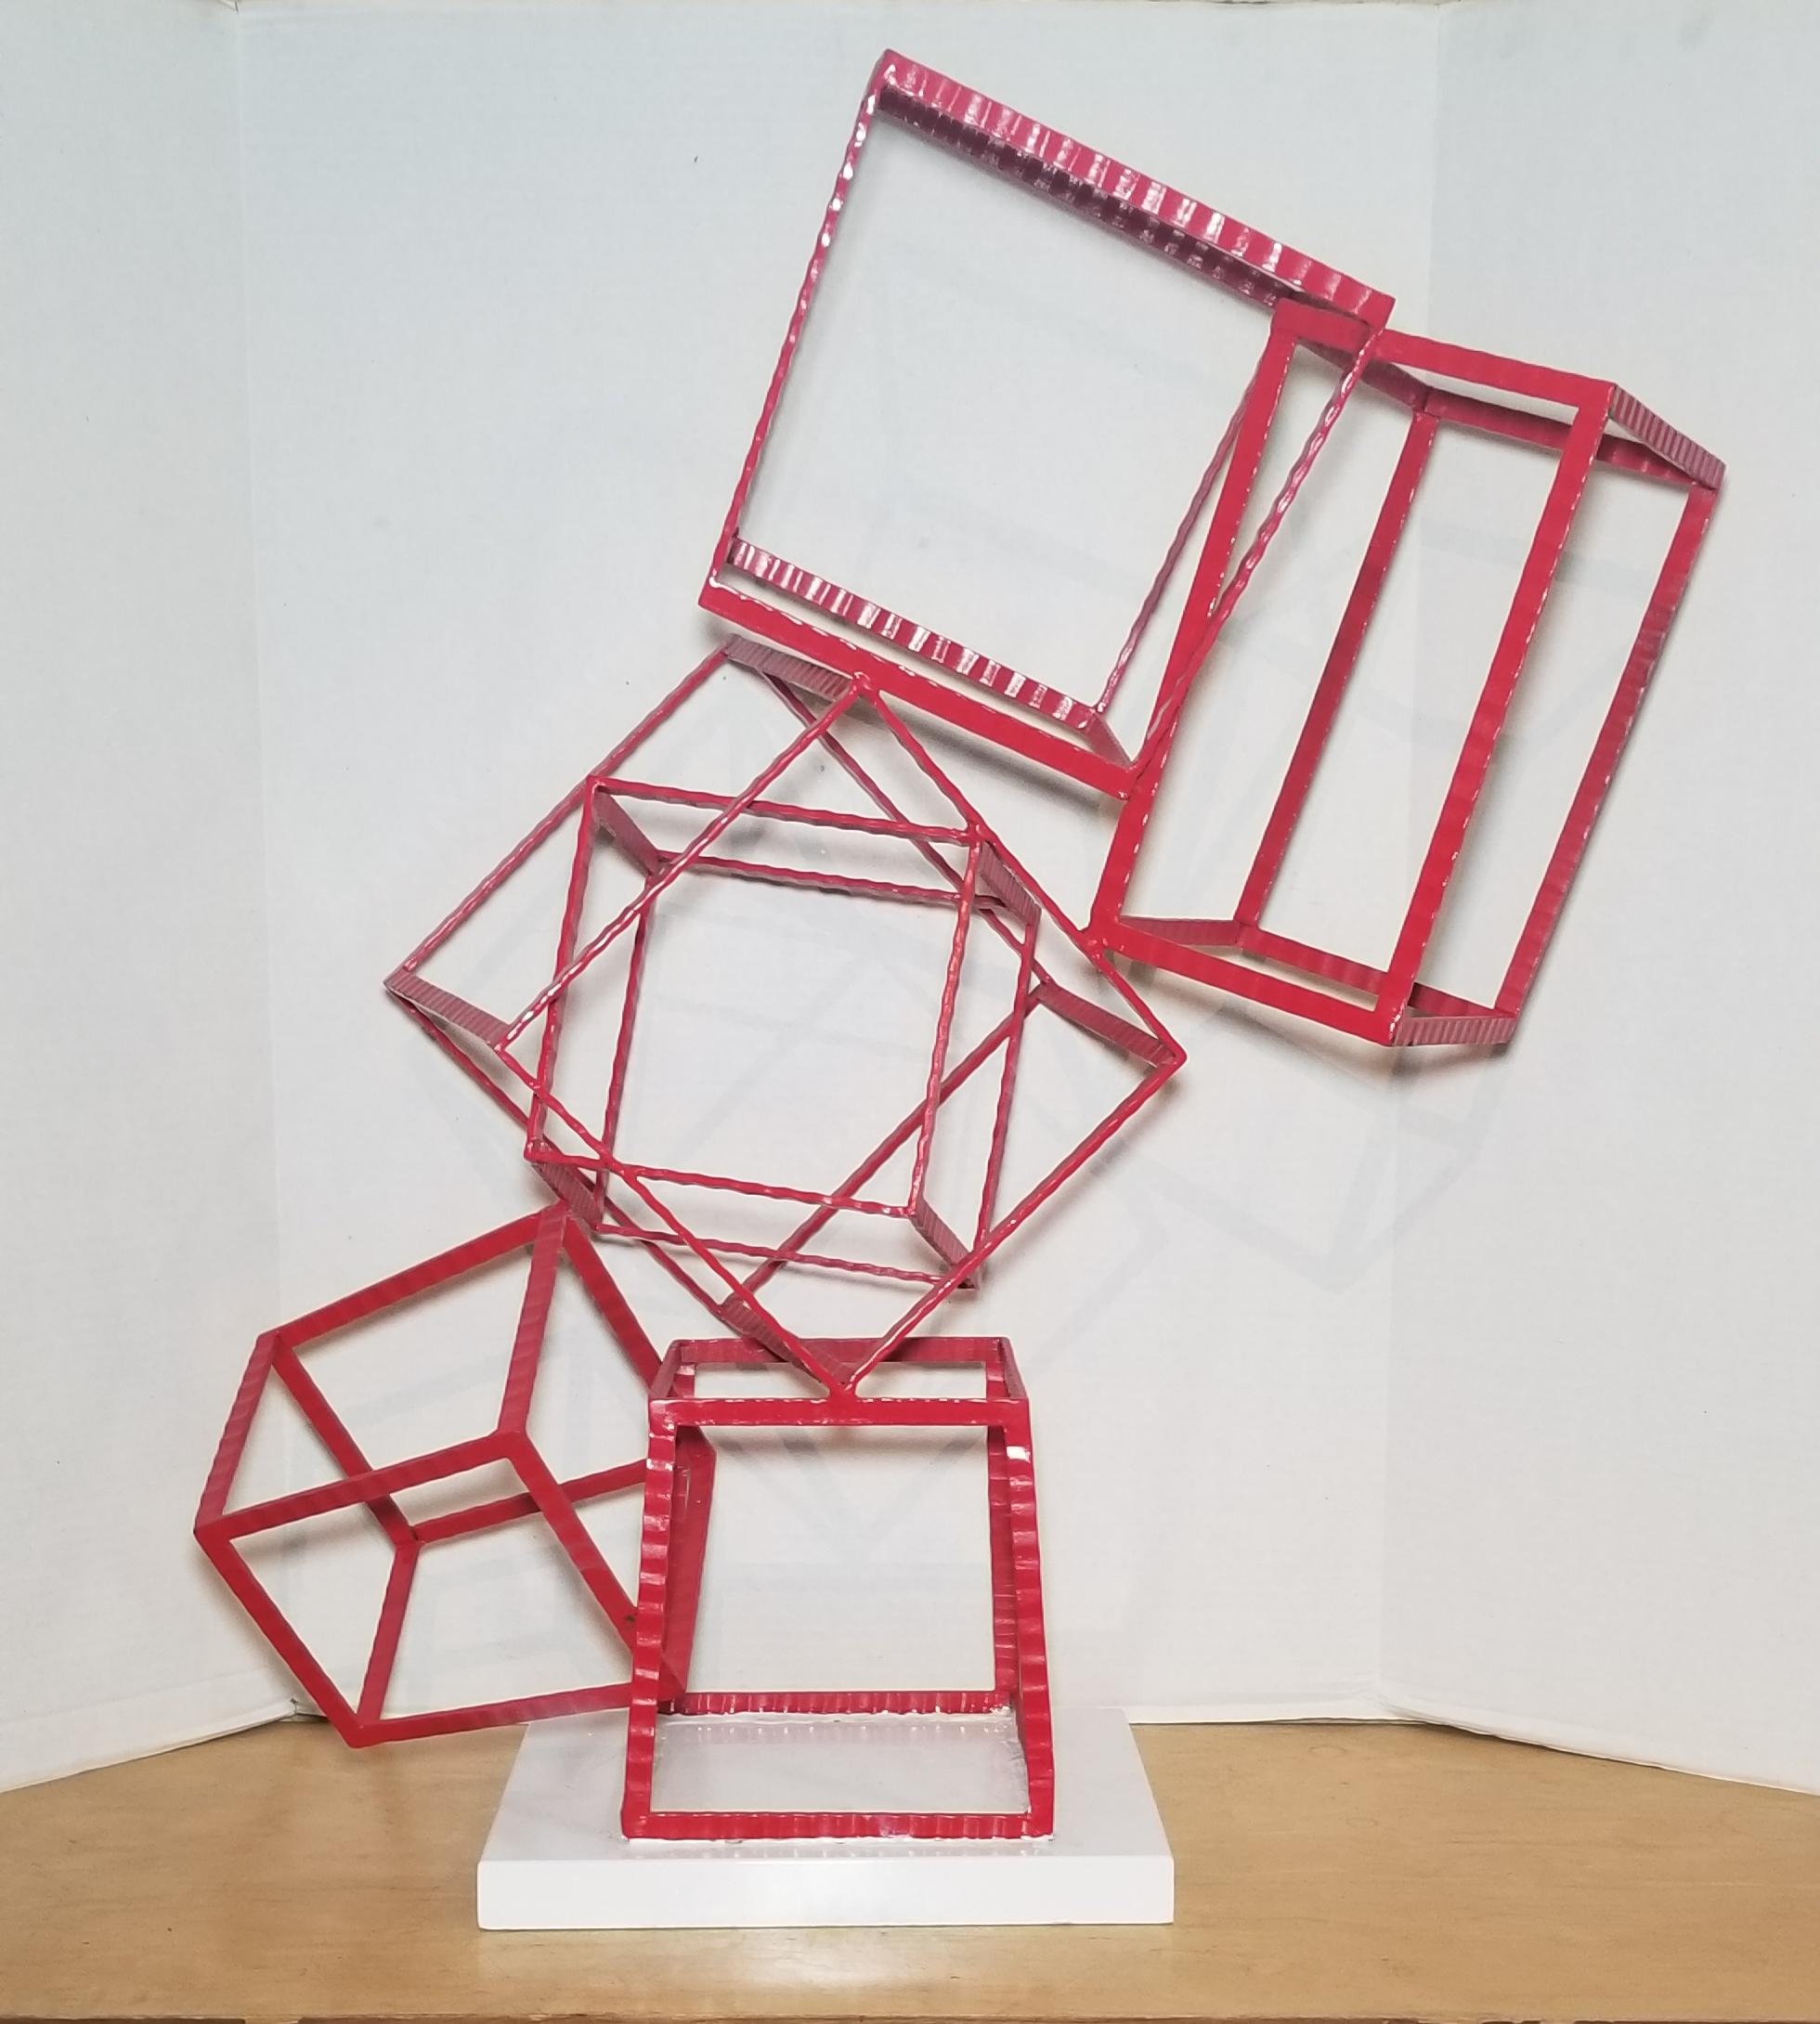 Abstract Art Cubes